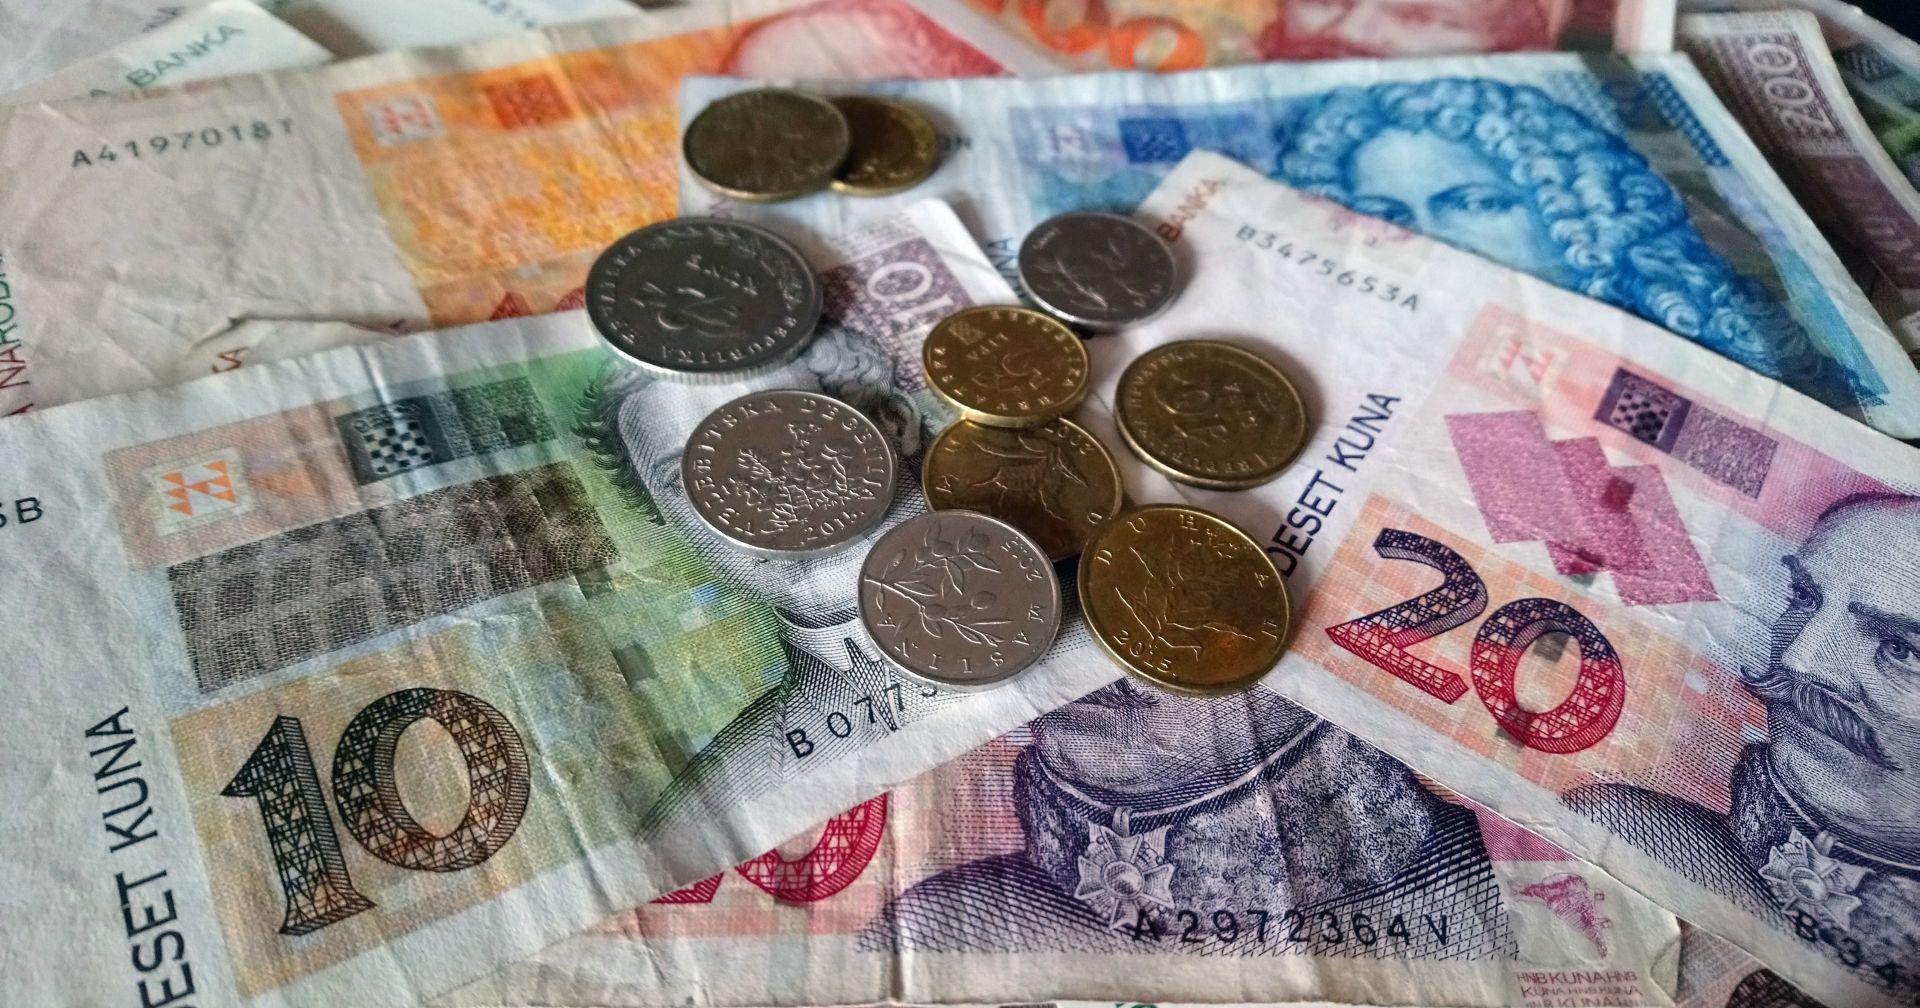 BOŽIĆNICE Konzumov radnik 1000, Lidlov 1500 a HEP-ovac 1200 kuna…